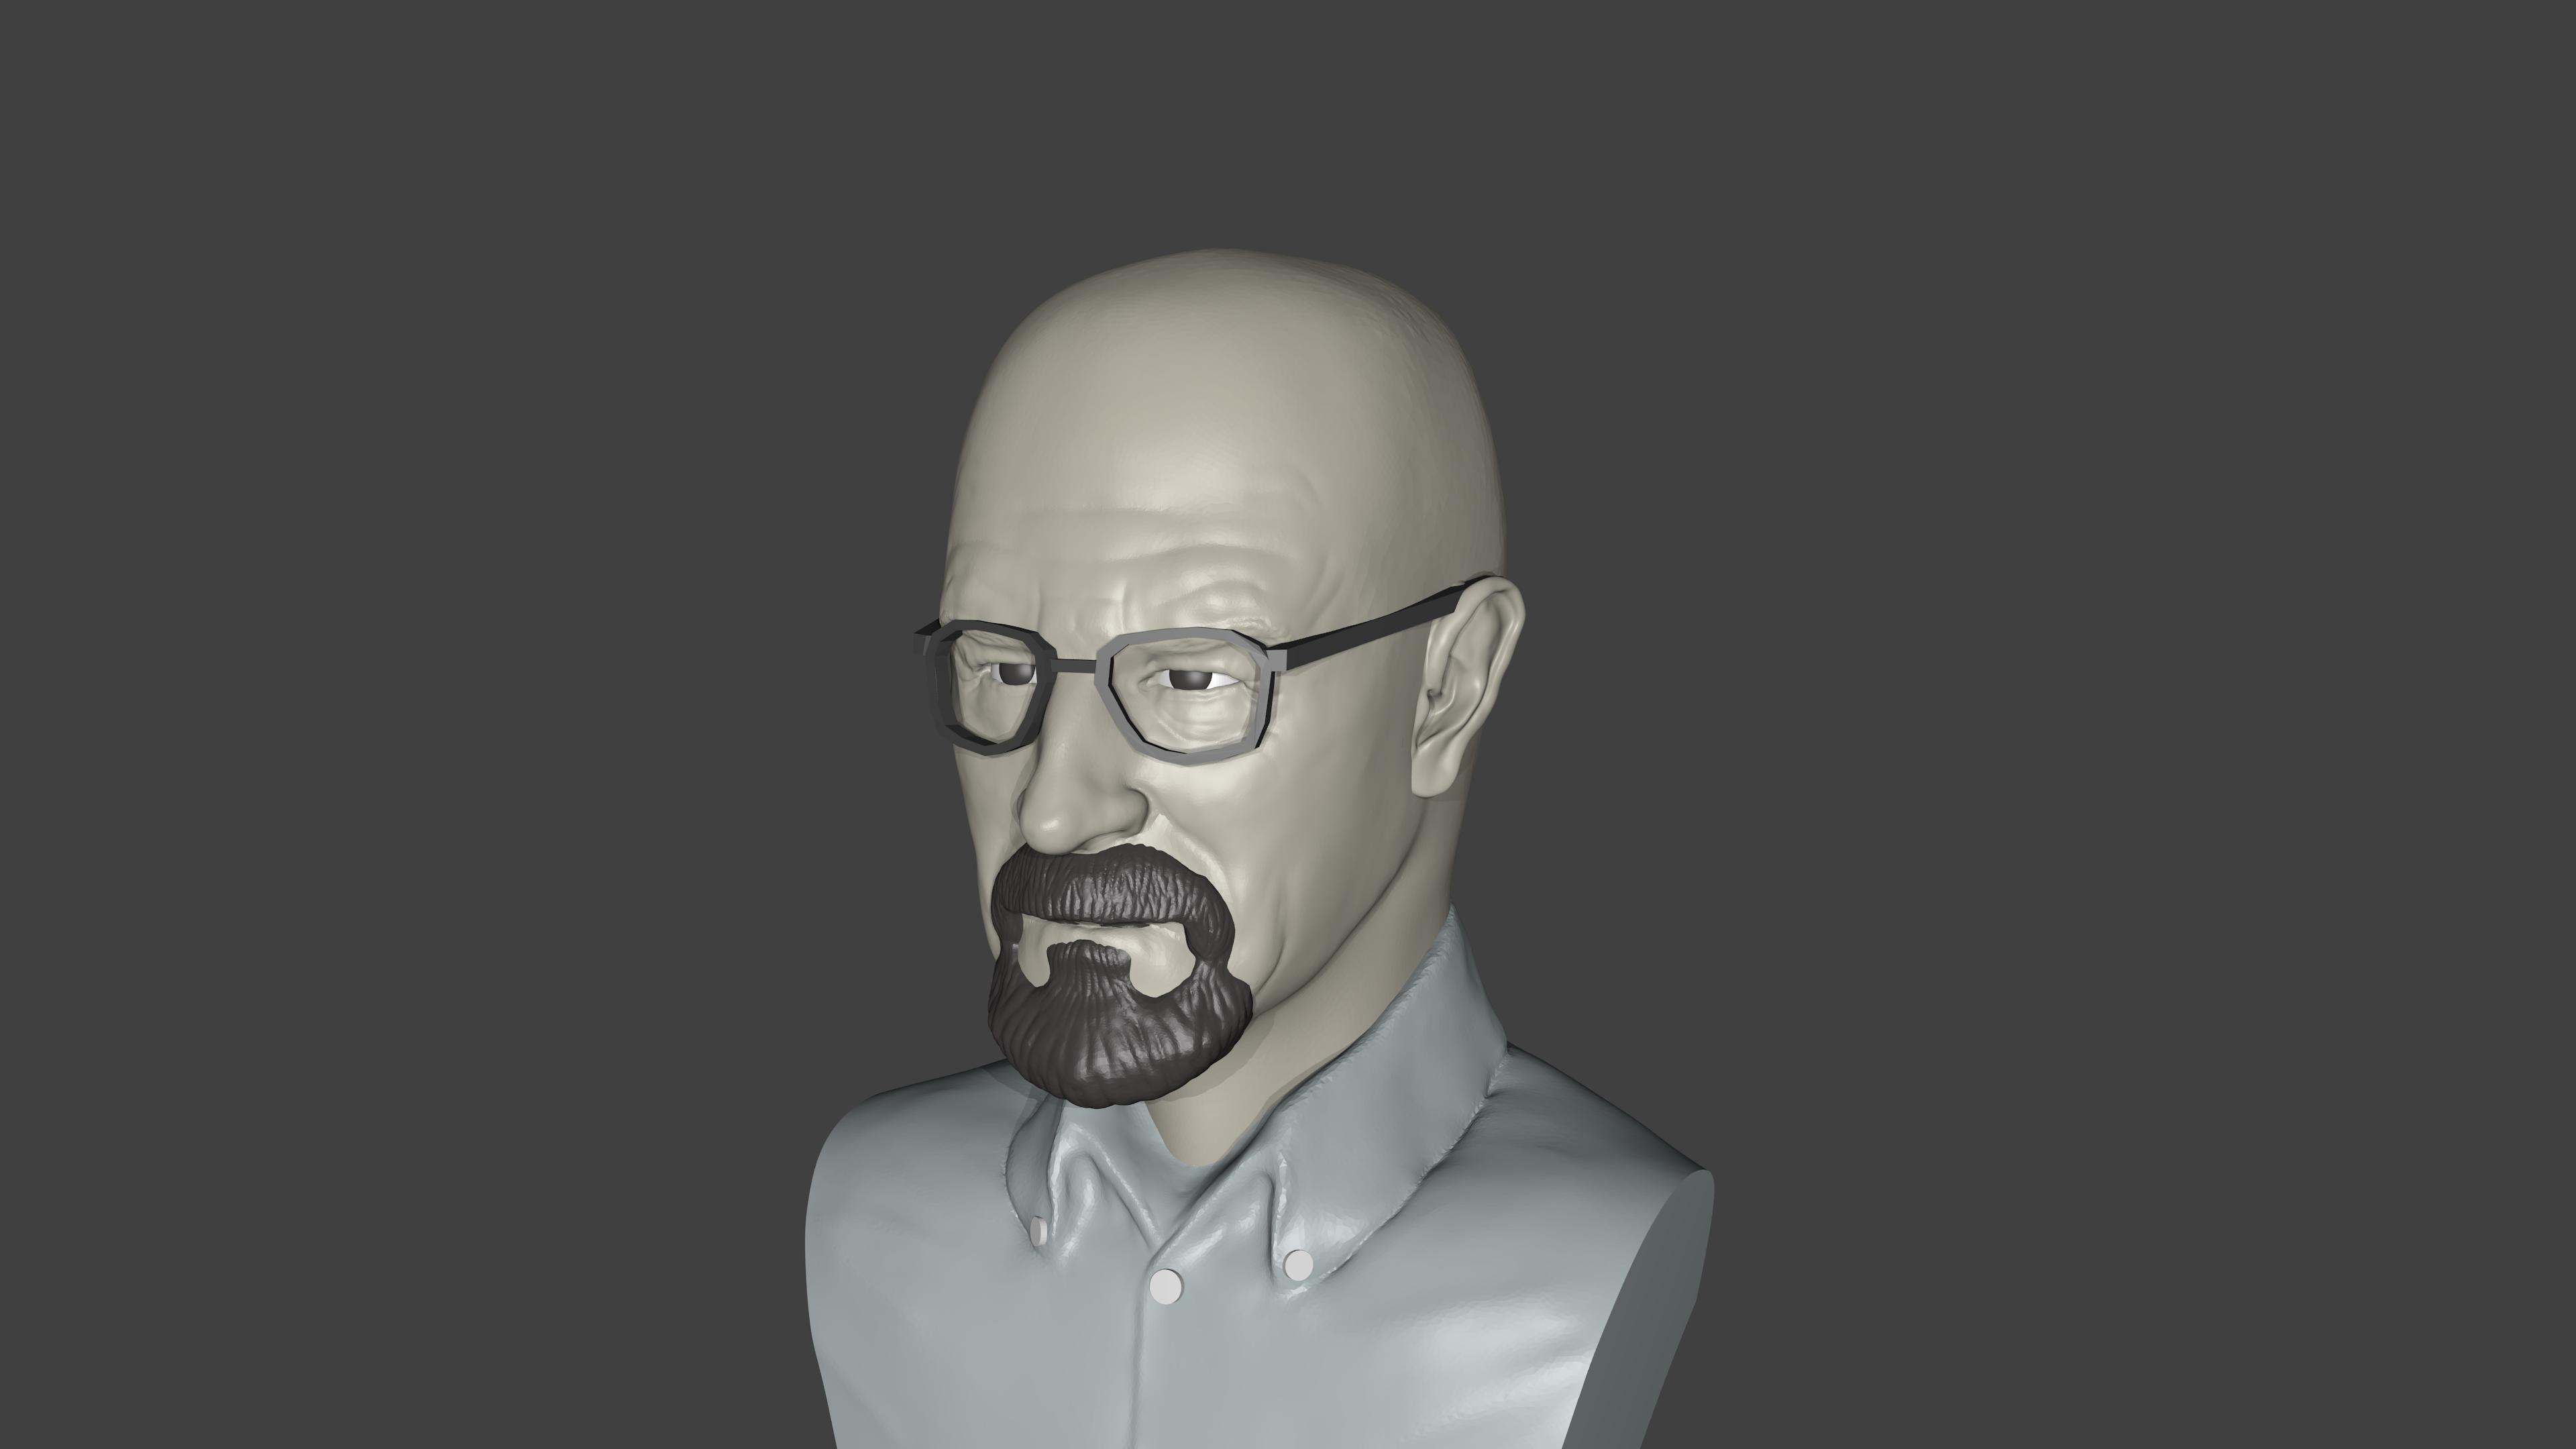 Render5.png Télécharger fichier STL gratuit Breaking Bad • Plan imprimable en 3D, Aslan3d